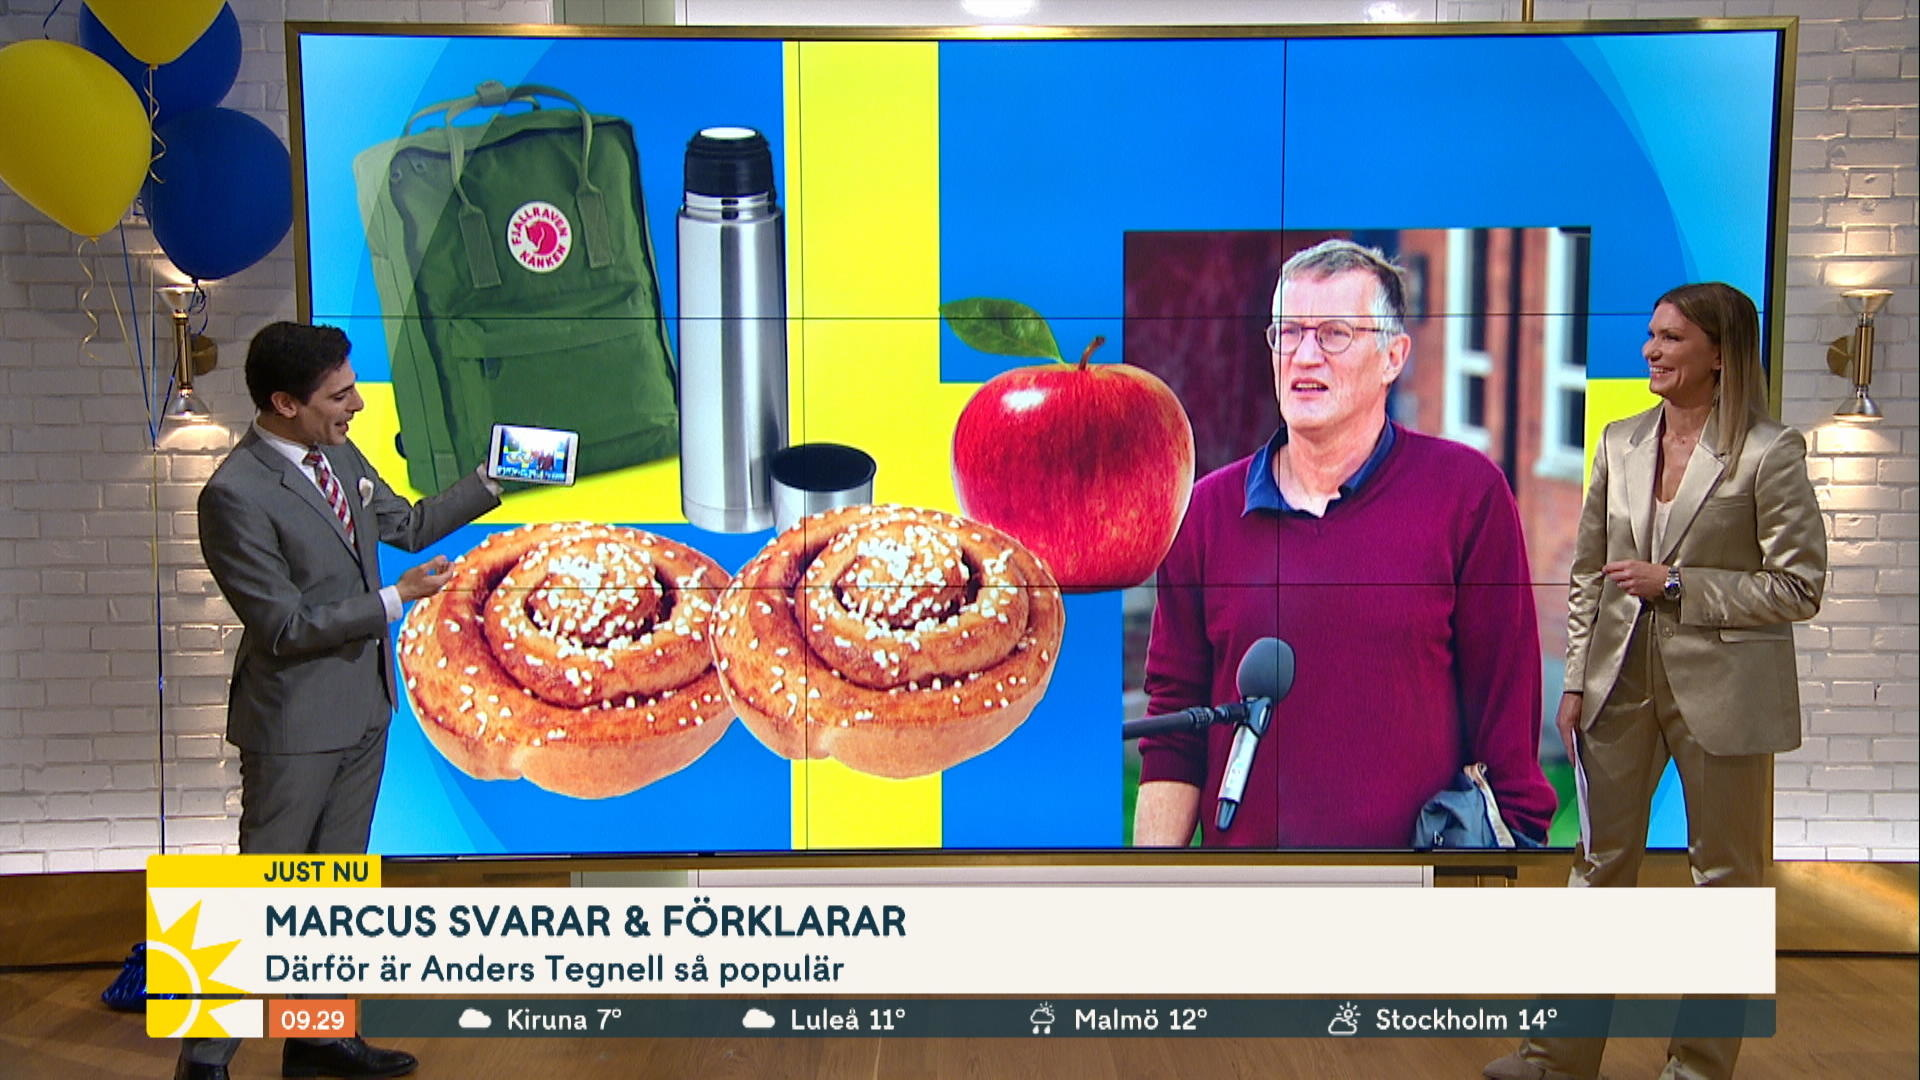 Marcus Darfor Vill Tittarna Se Tegnell Som President Nyhetsmorgon Tv4 Se